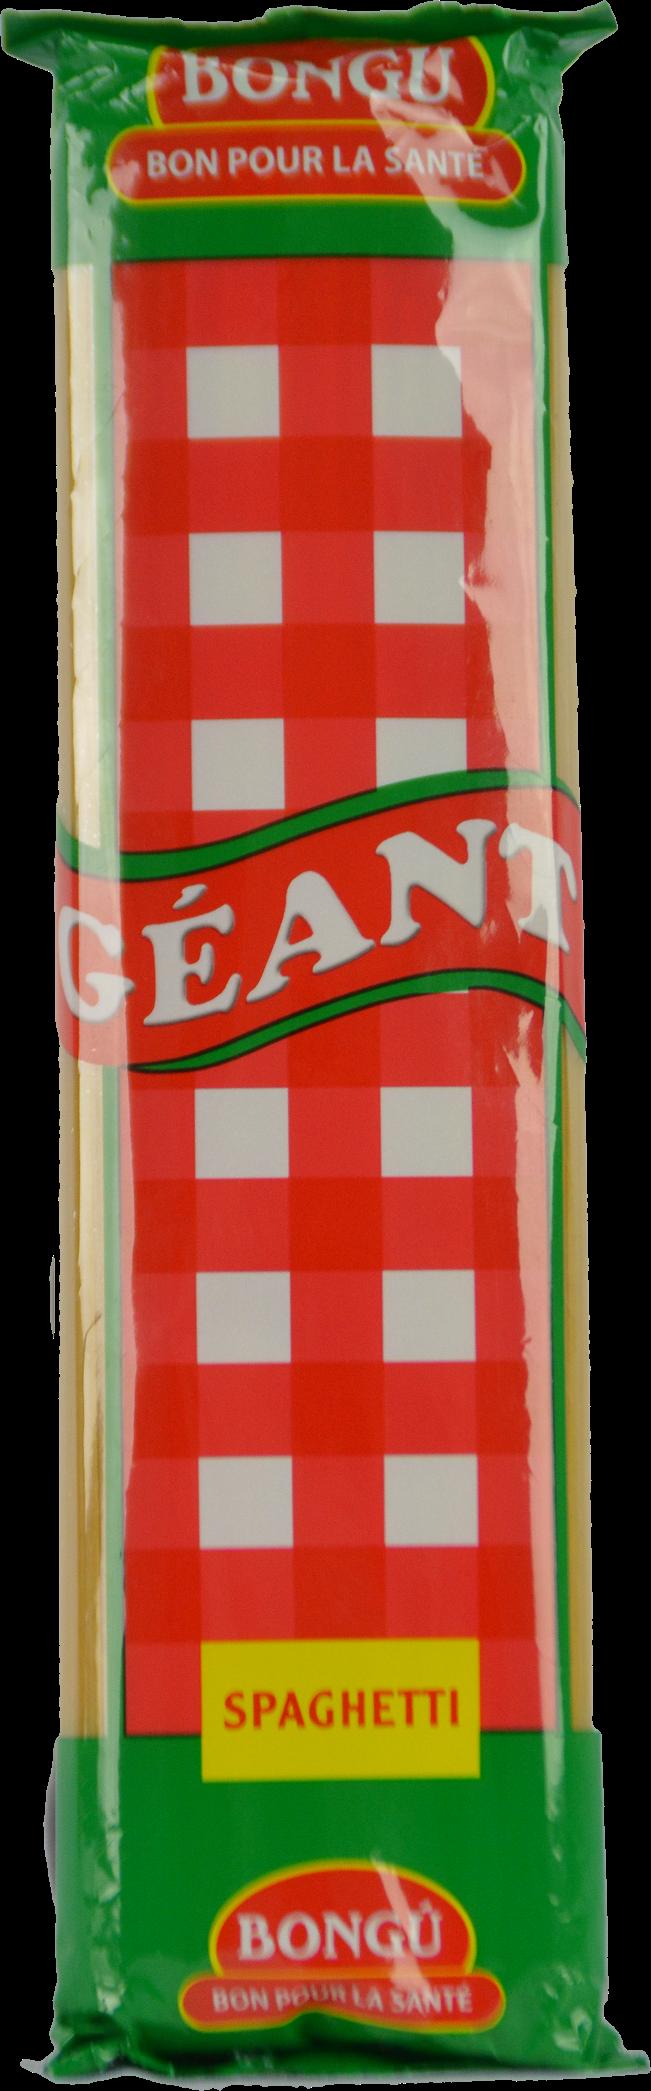 Spaguetti Geant / Half Case of 6 packs